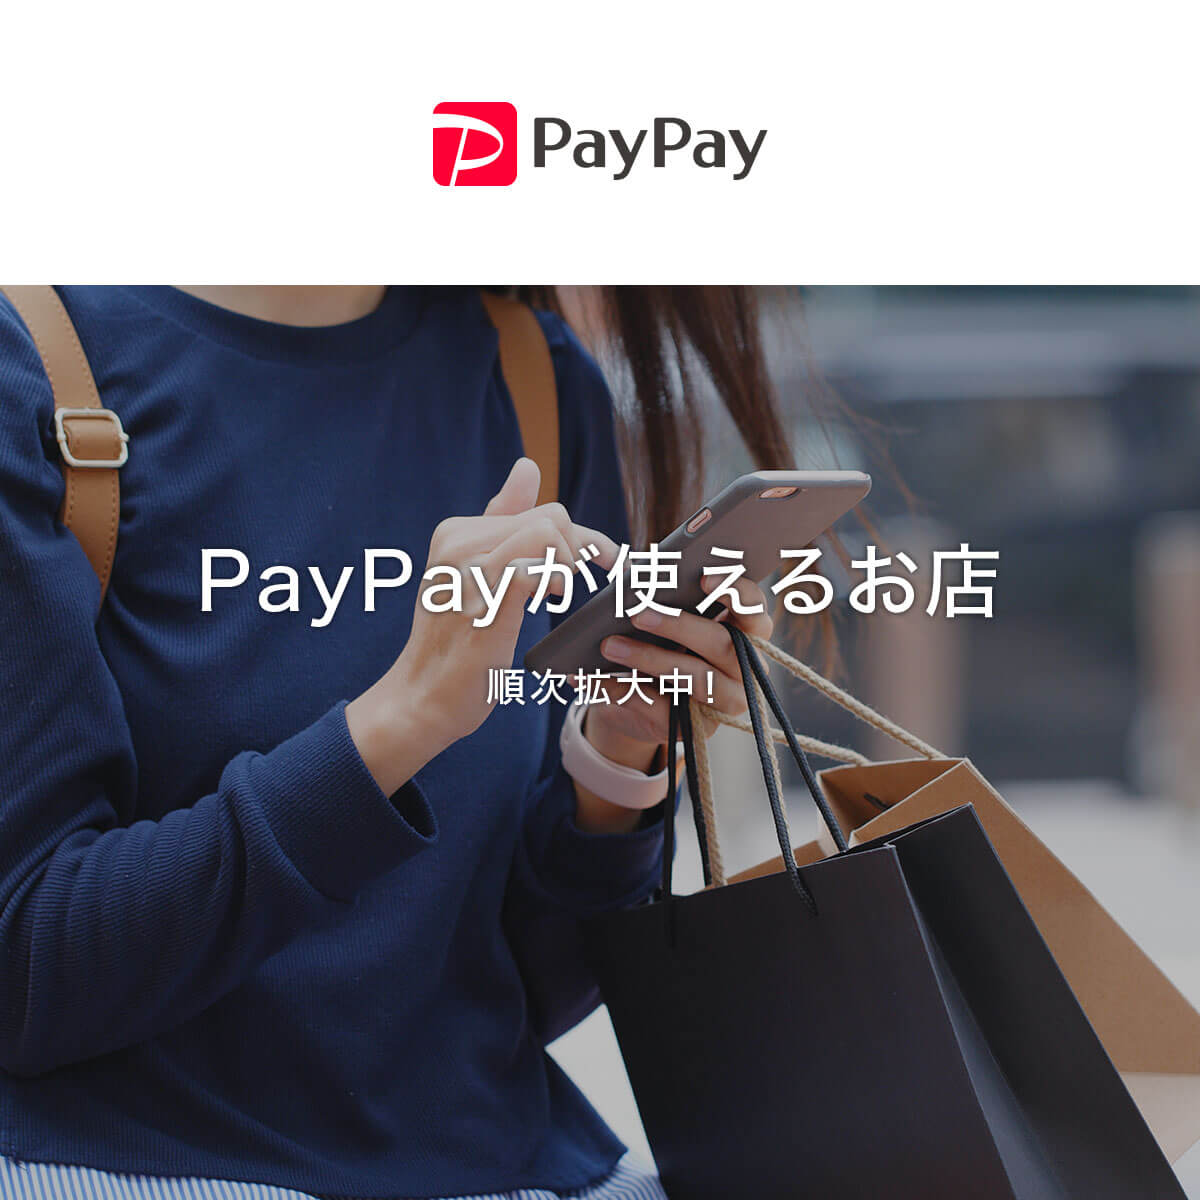 PayPayが使えるお店 - PayPay